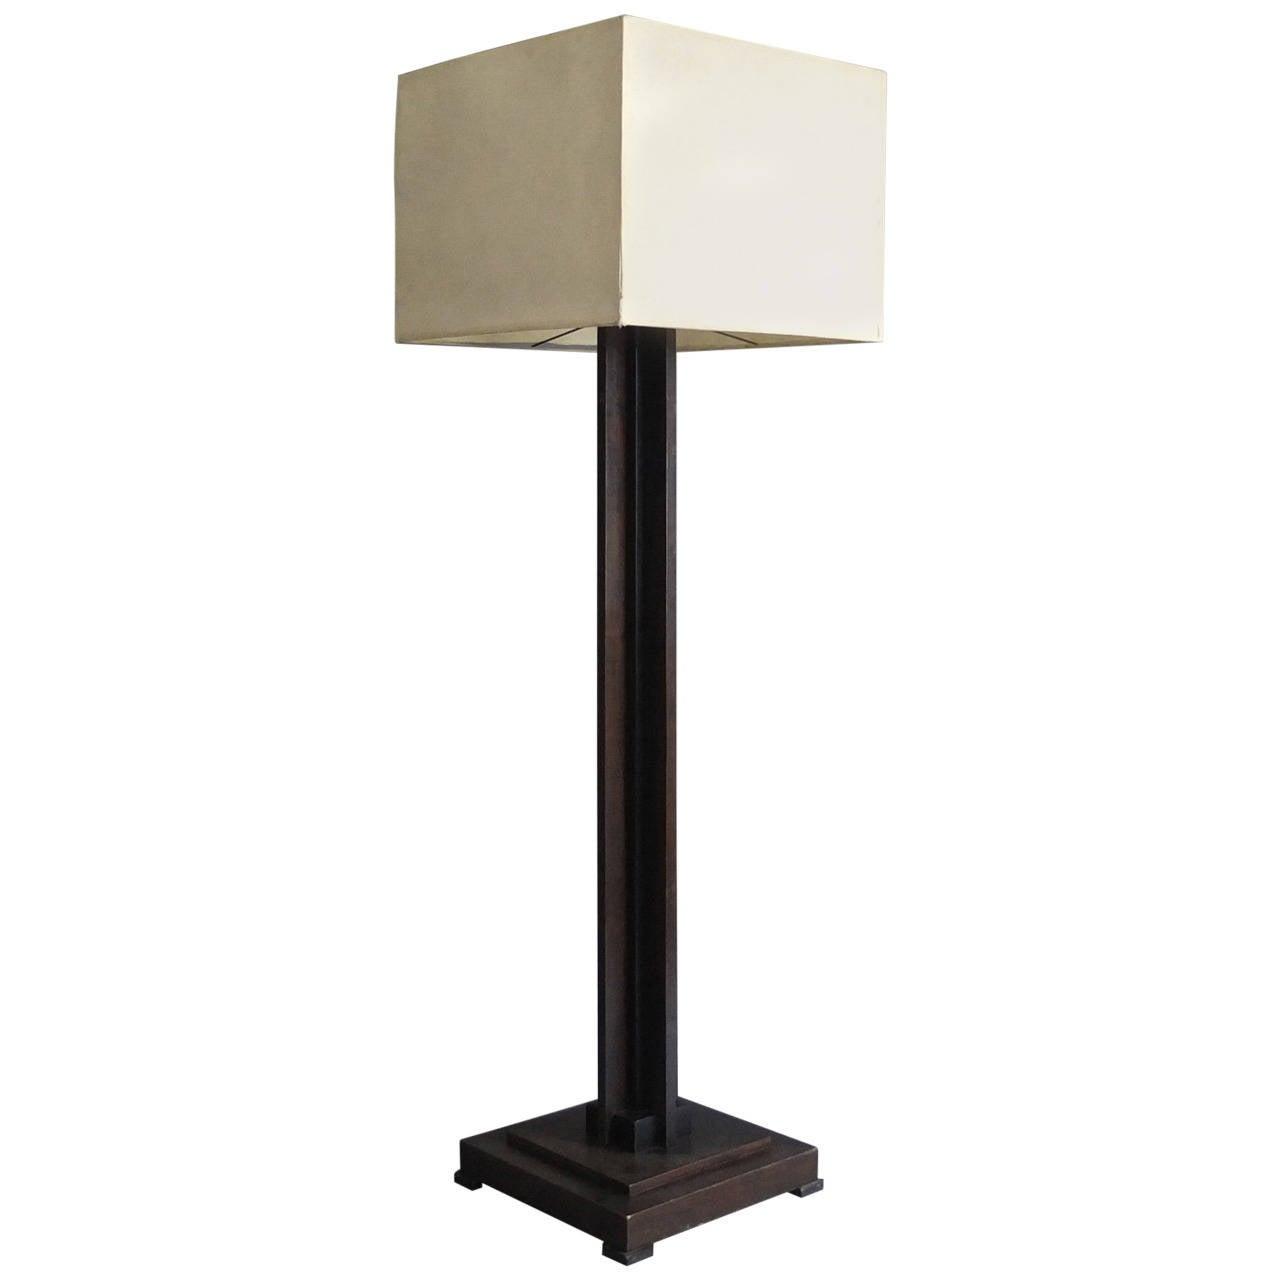 Fine French Art Deco Floor Lamp At 1stdibs